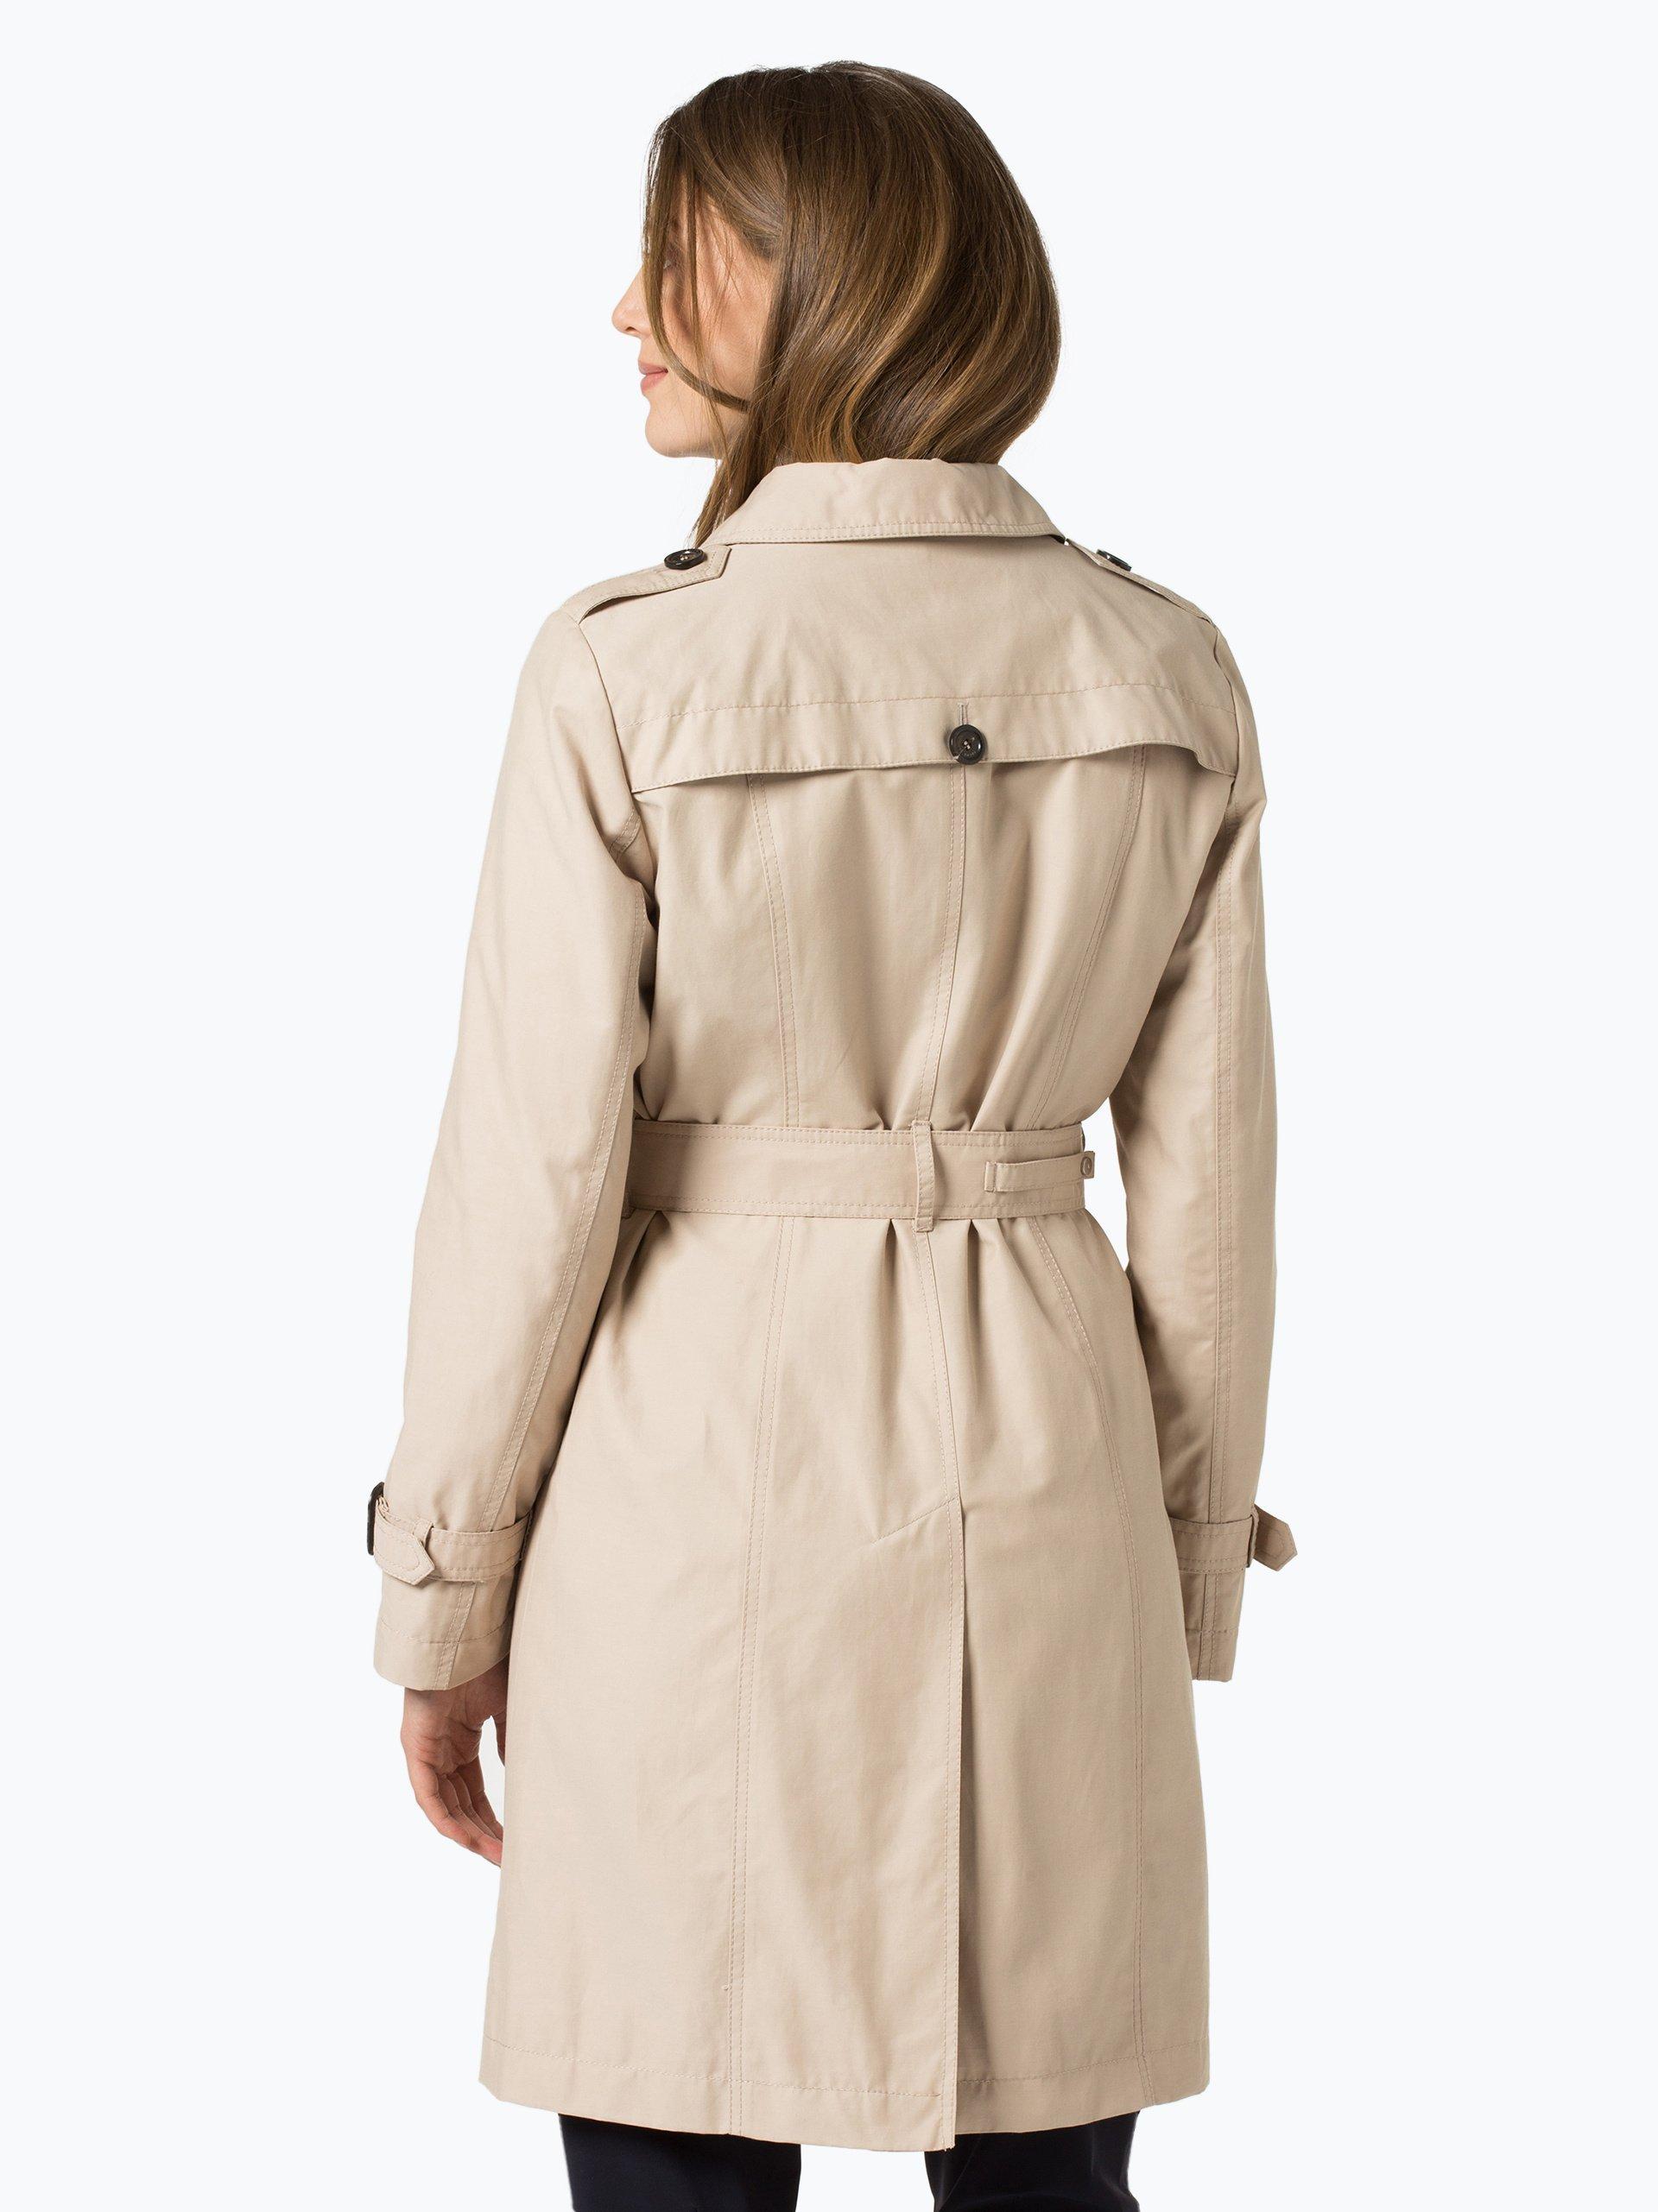 fuchs schmitt damen mantel beige uni online kaufen vangraaf com. Black Bedroom Furniture Sets. Home Design Ideas